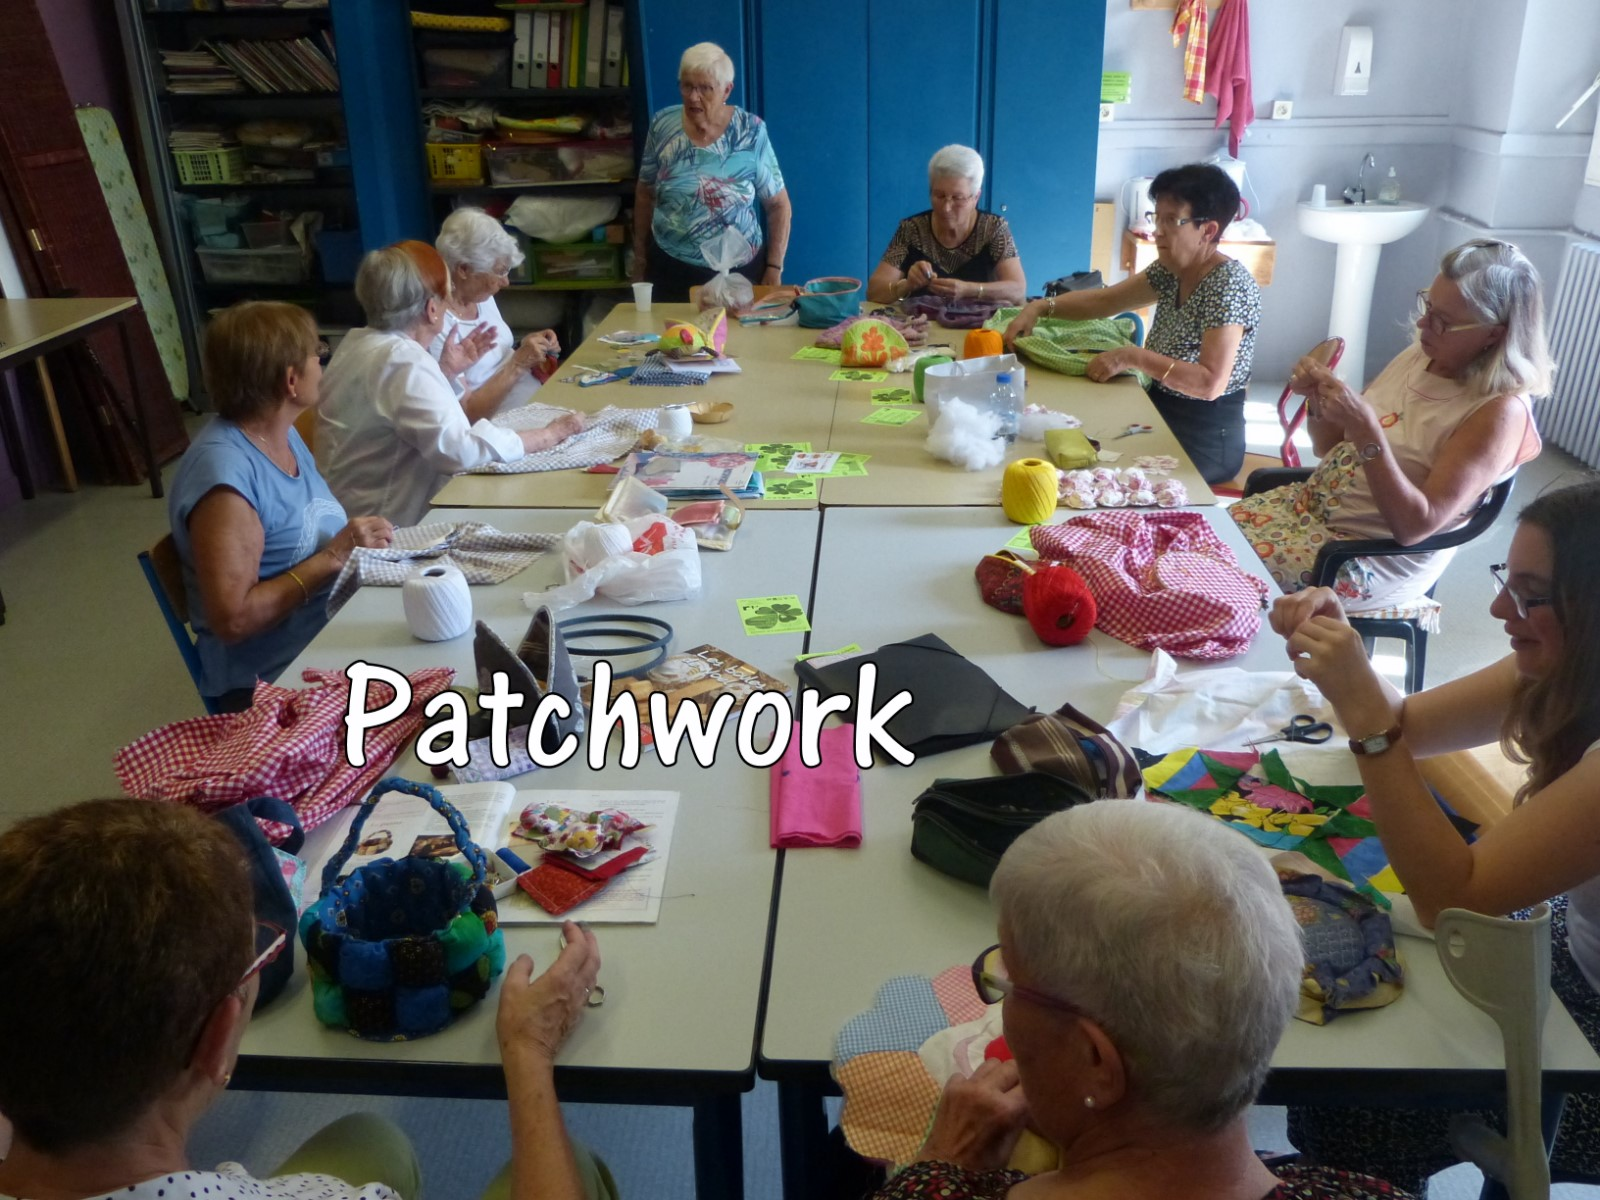 147Patchwork-3